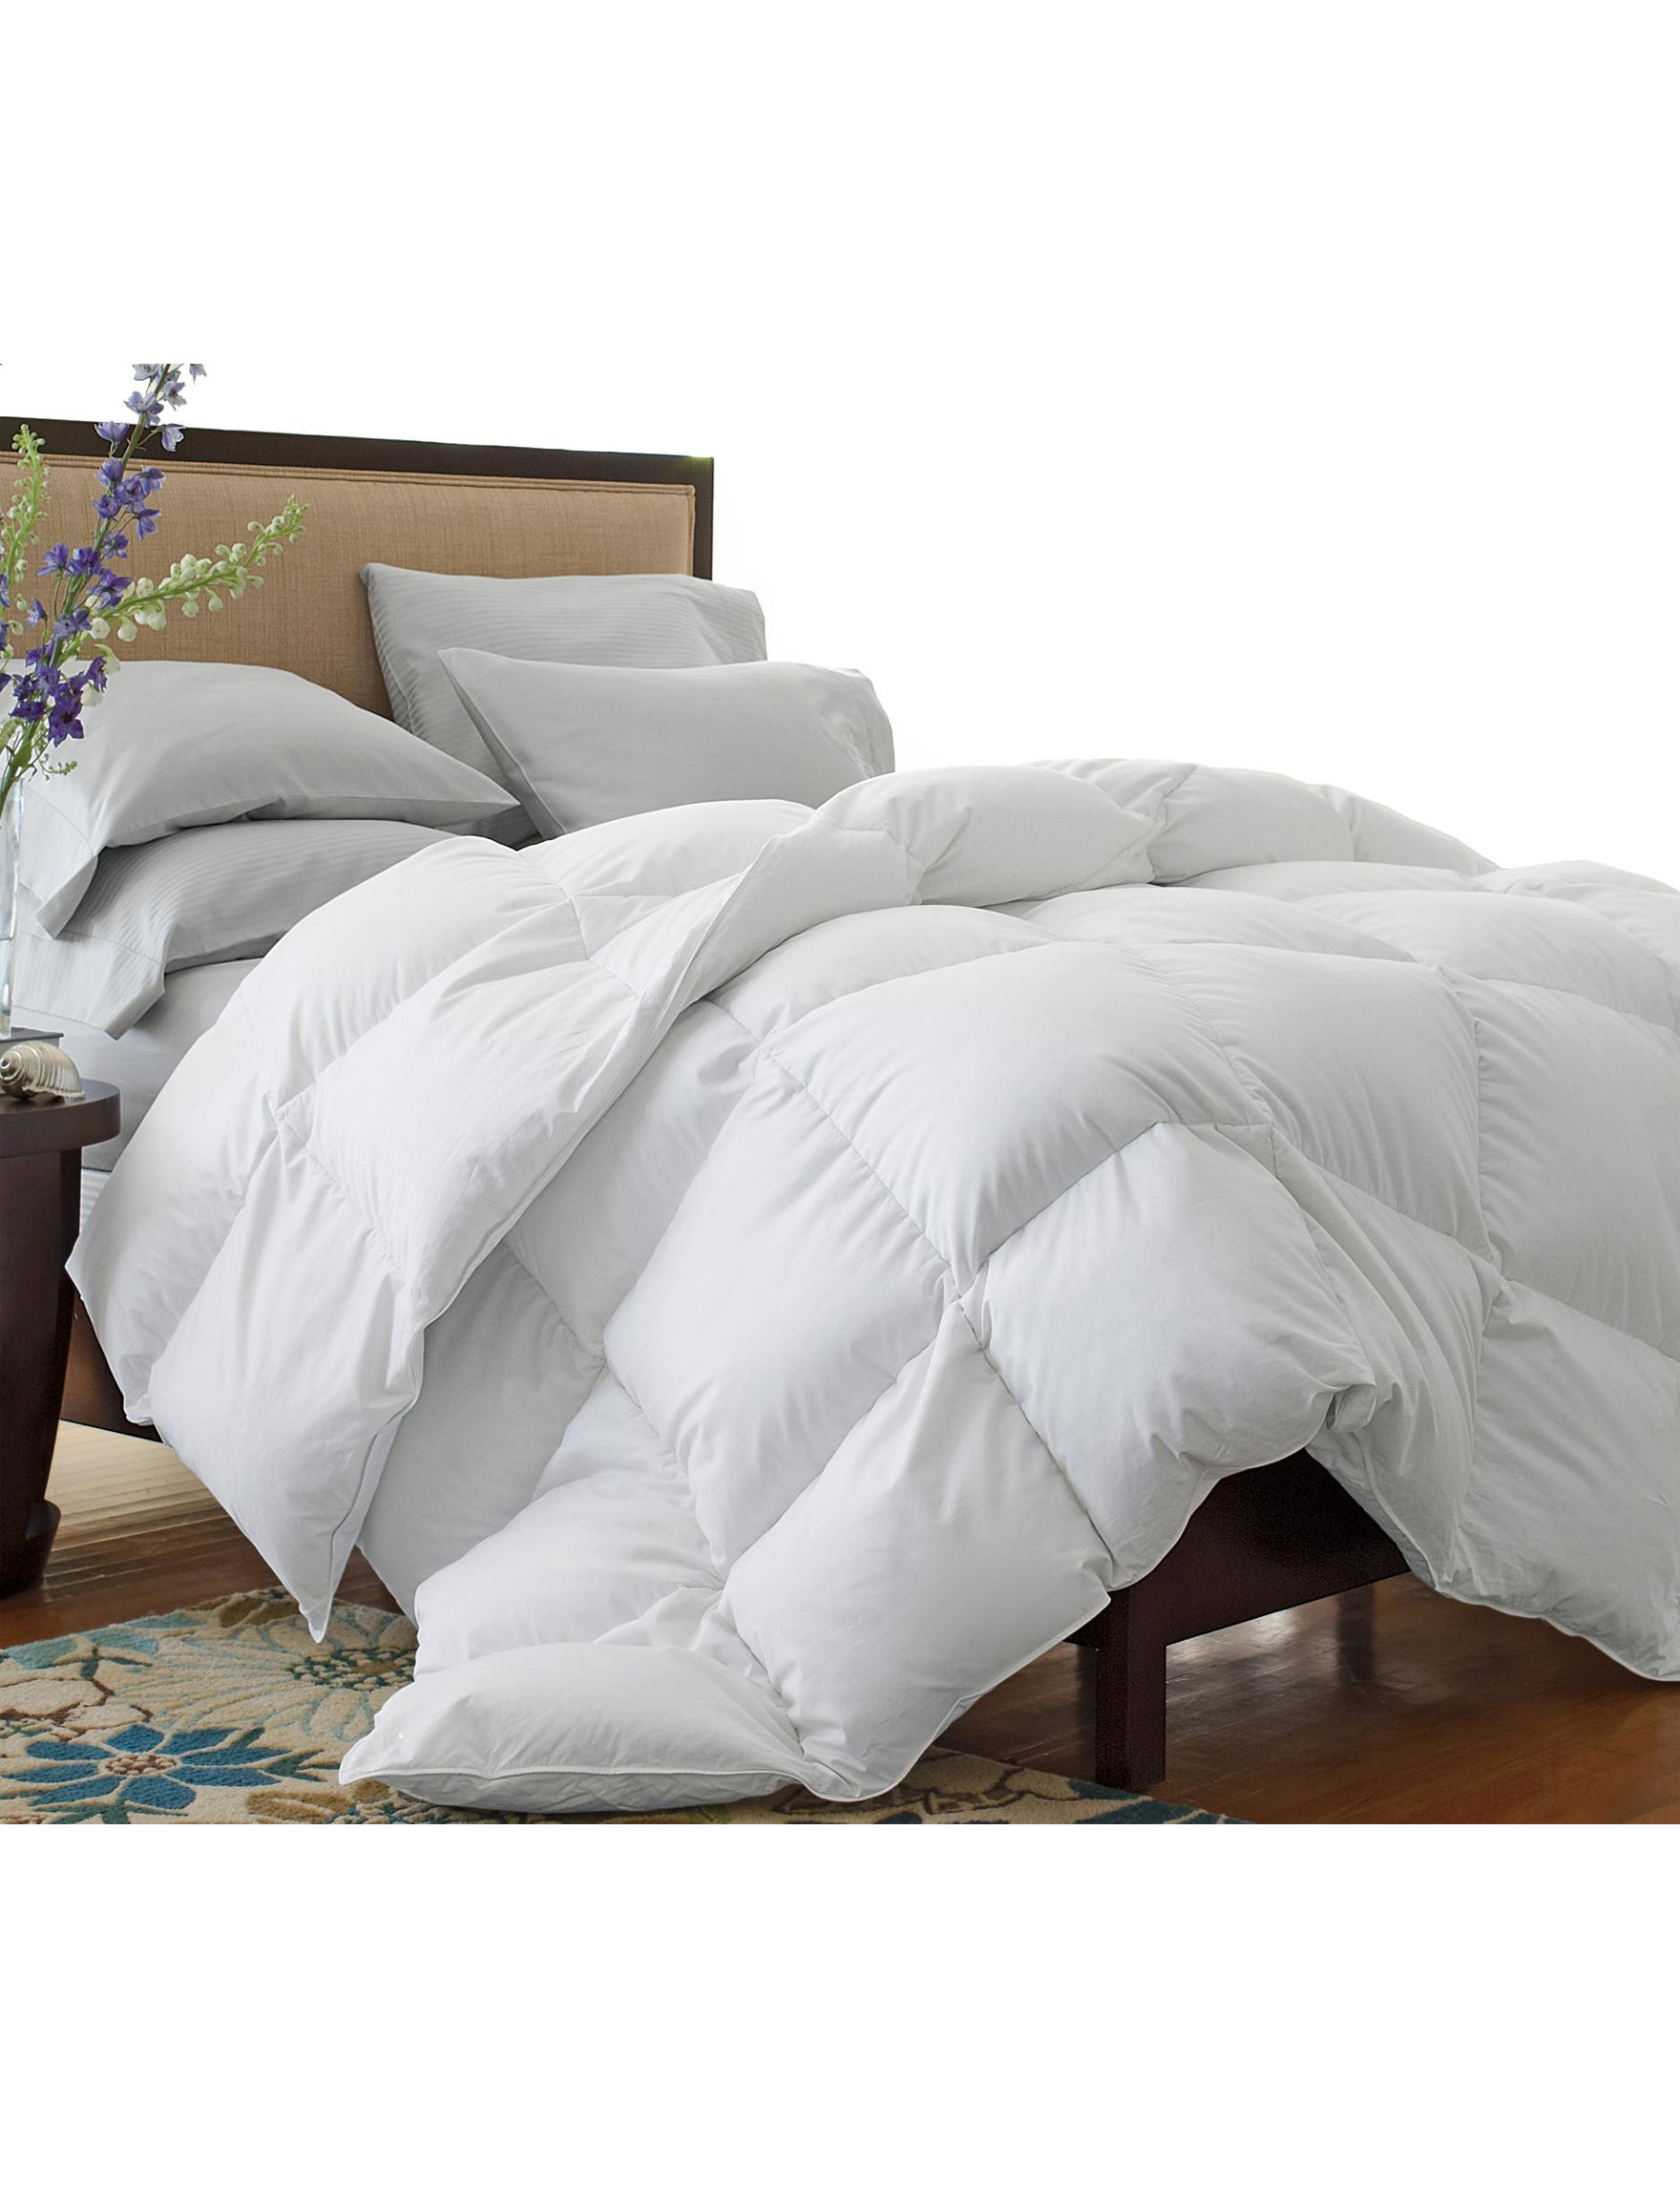 Superior White Down & Down Alternative Comforters